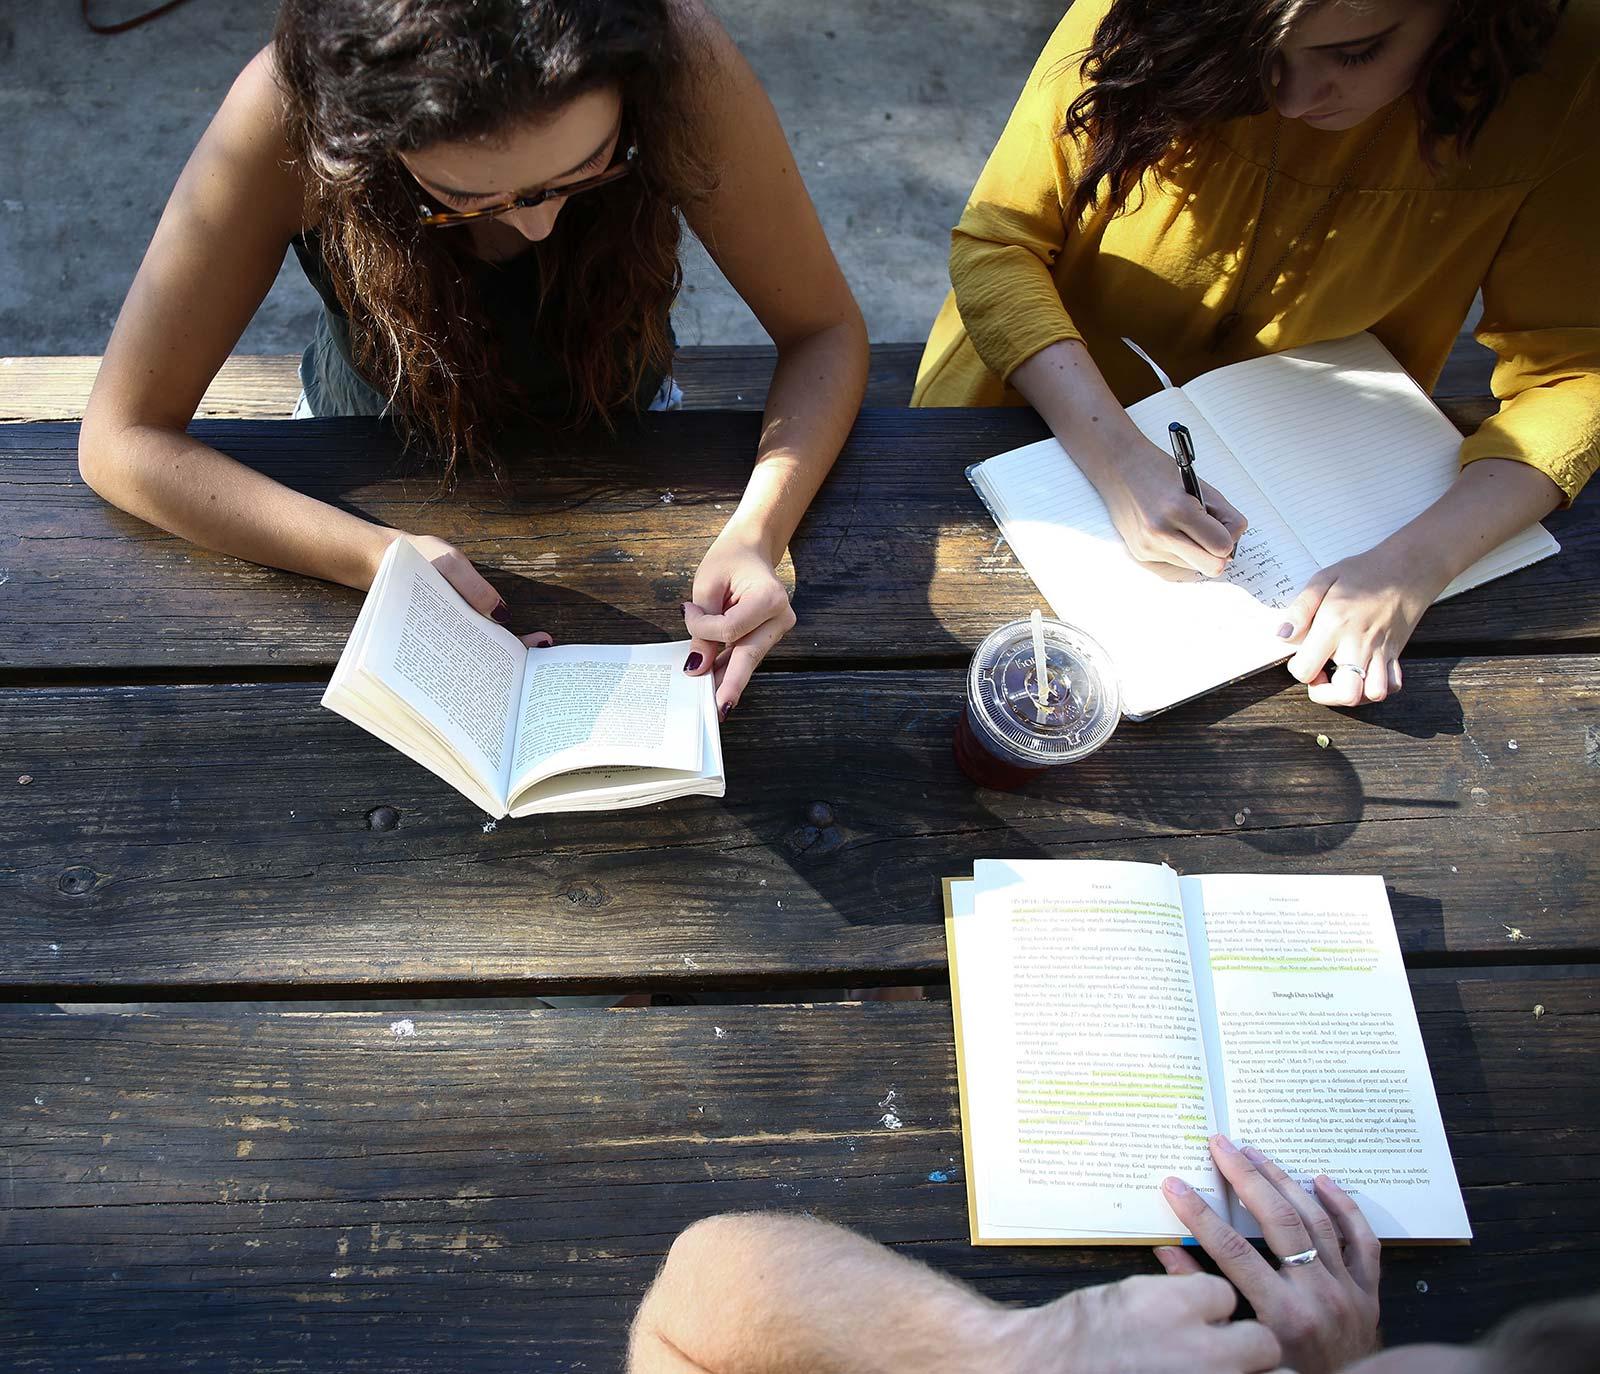 Schüler*innen (Foto © Alexis Brown, unsplash.com) | BRG Wörgl